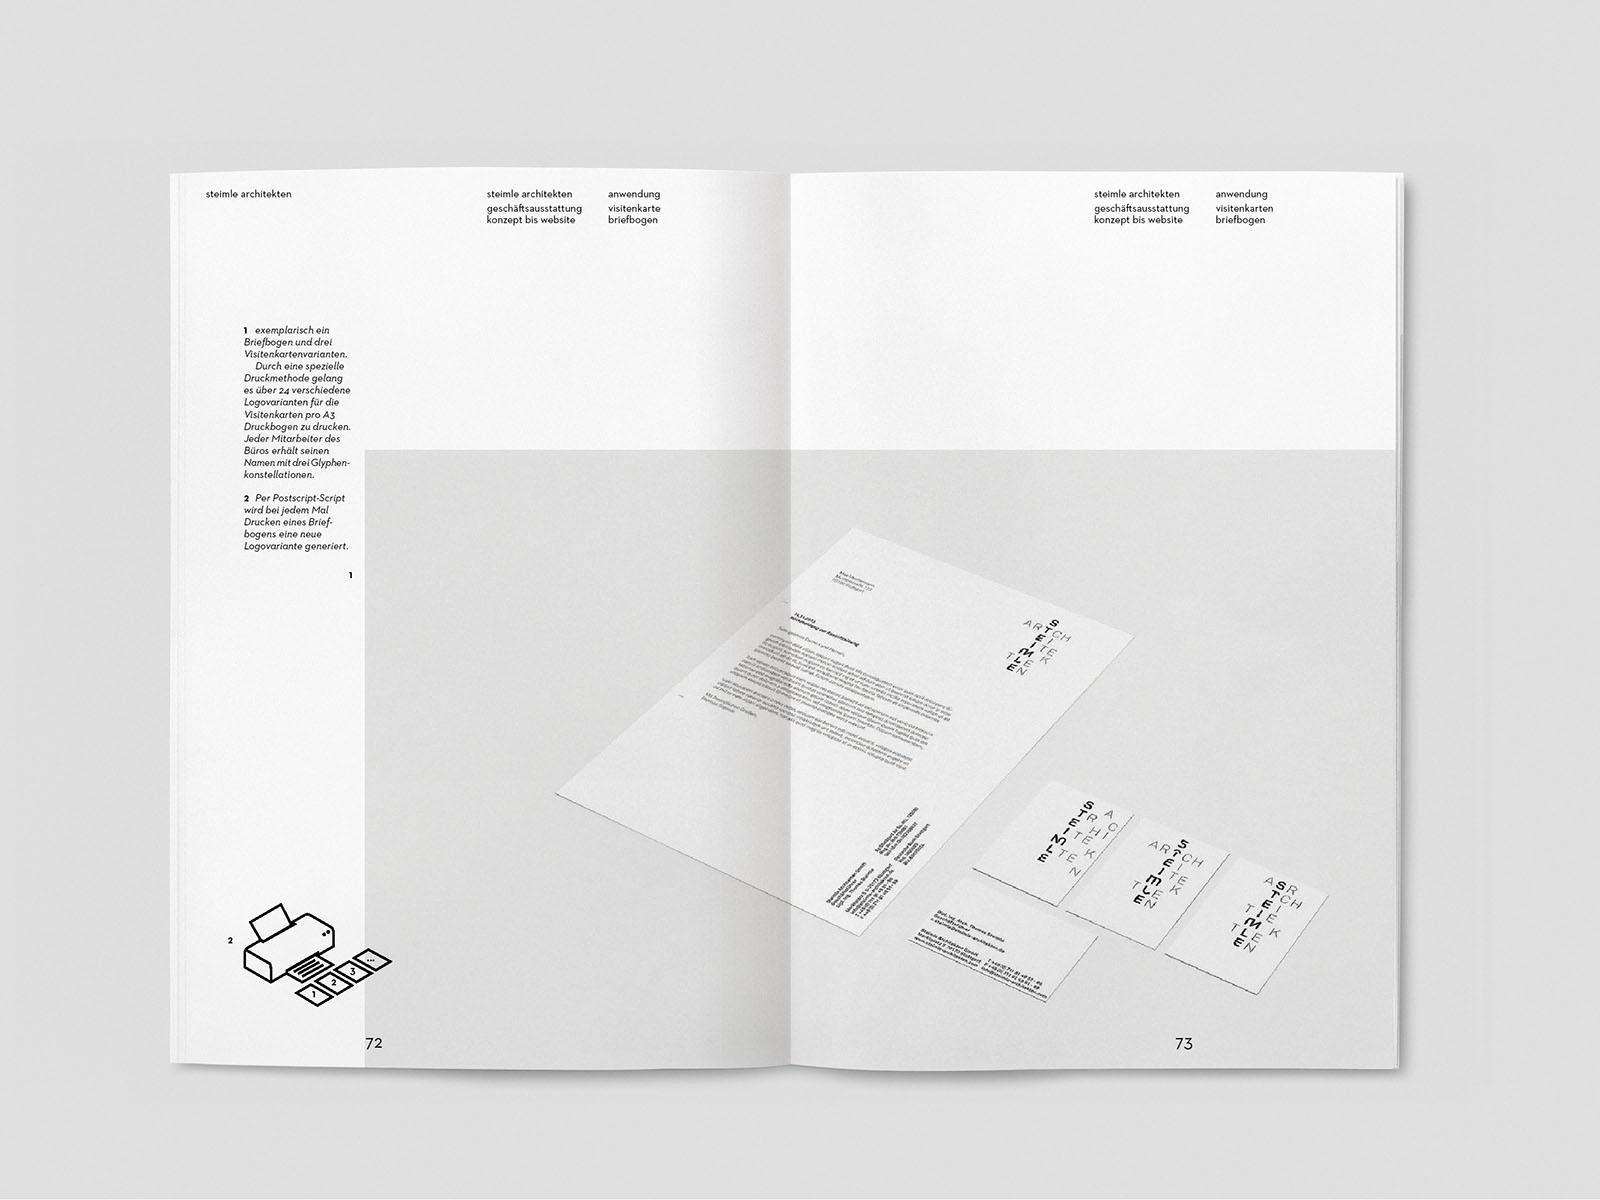 Tobias Kuesters Kommunikationsdesign 2015 Selection Of Work